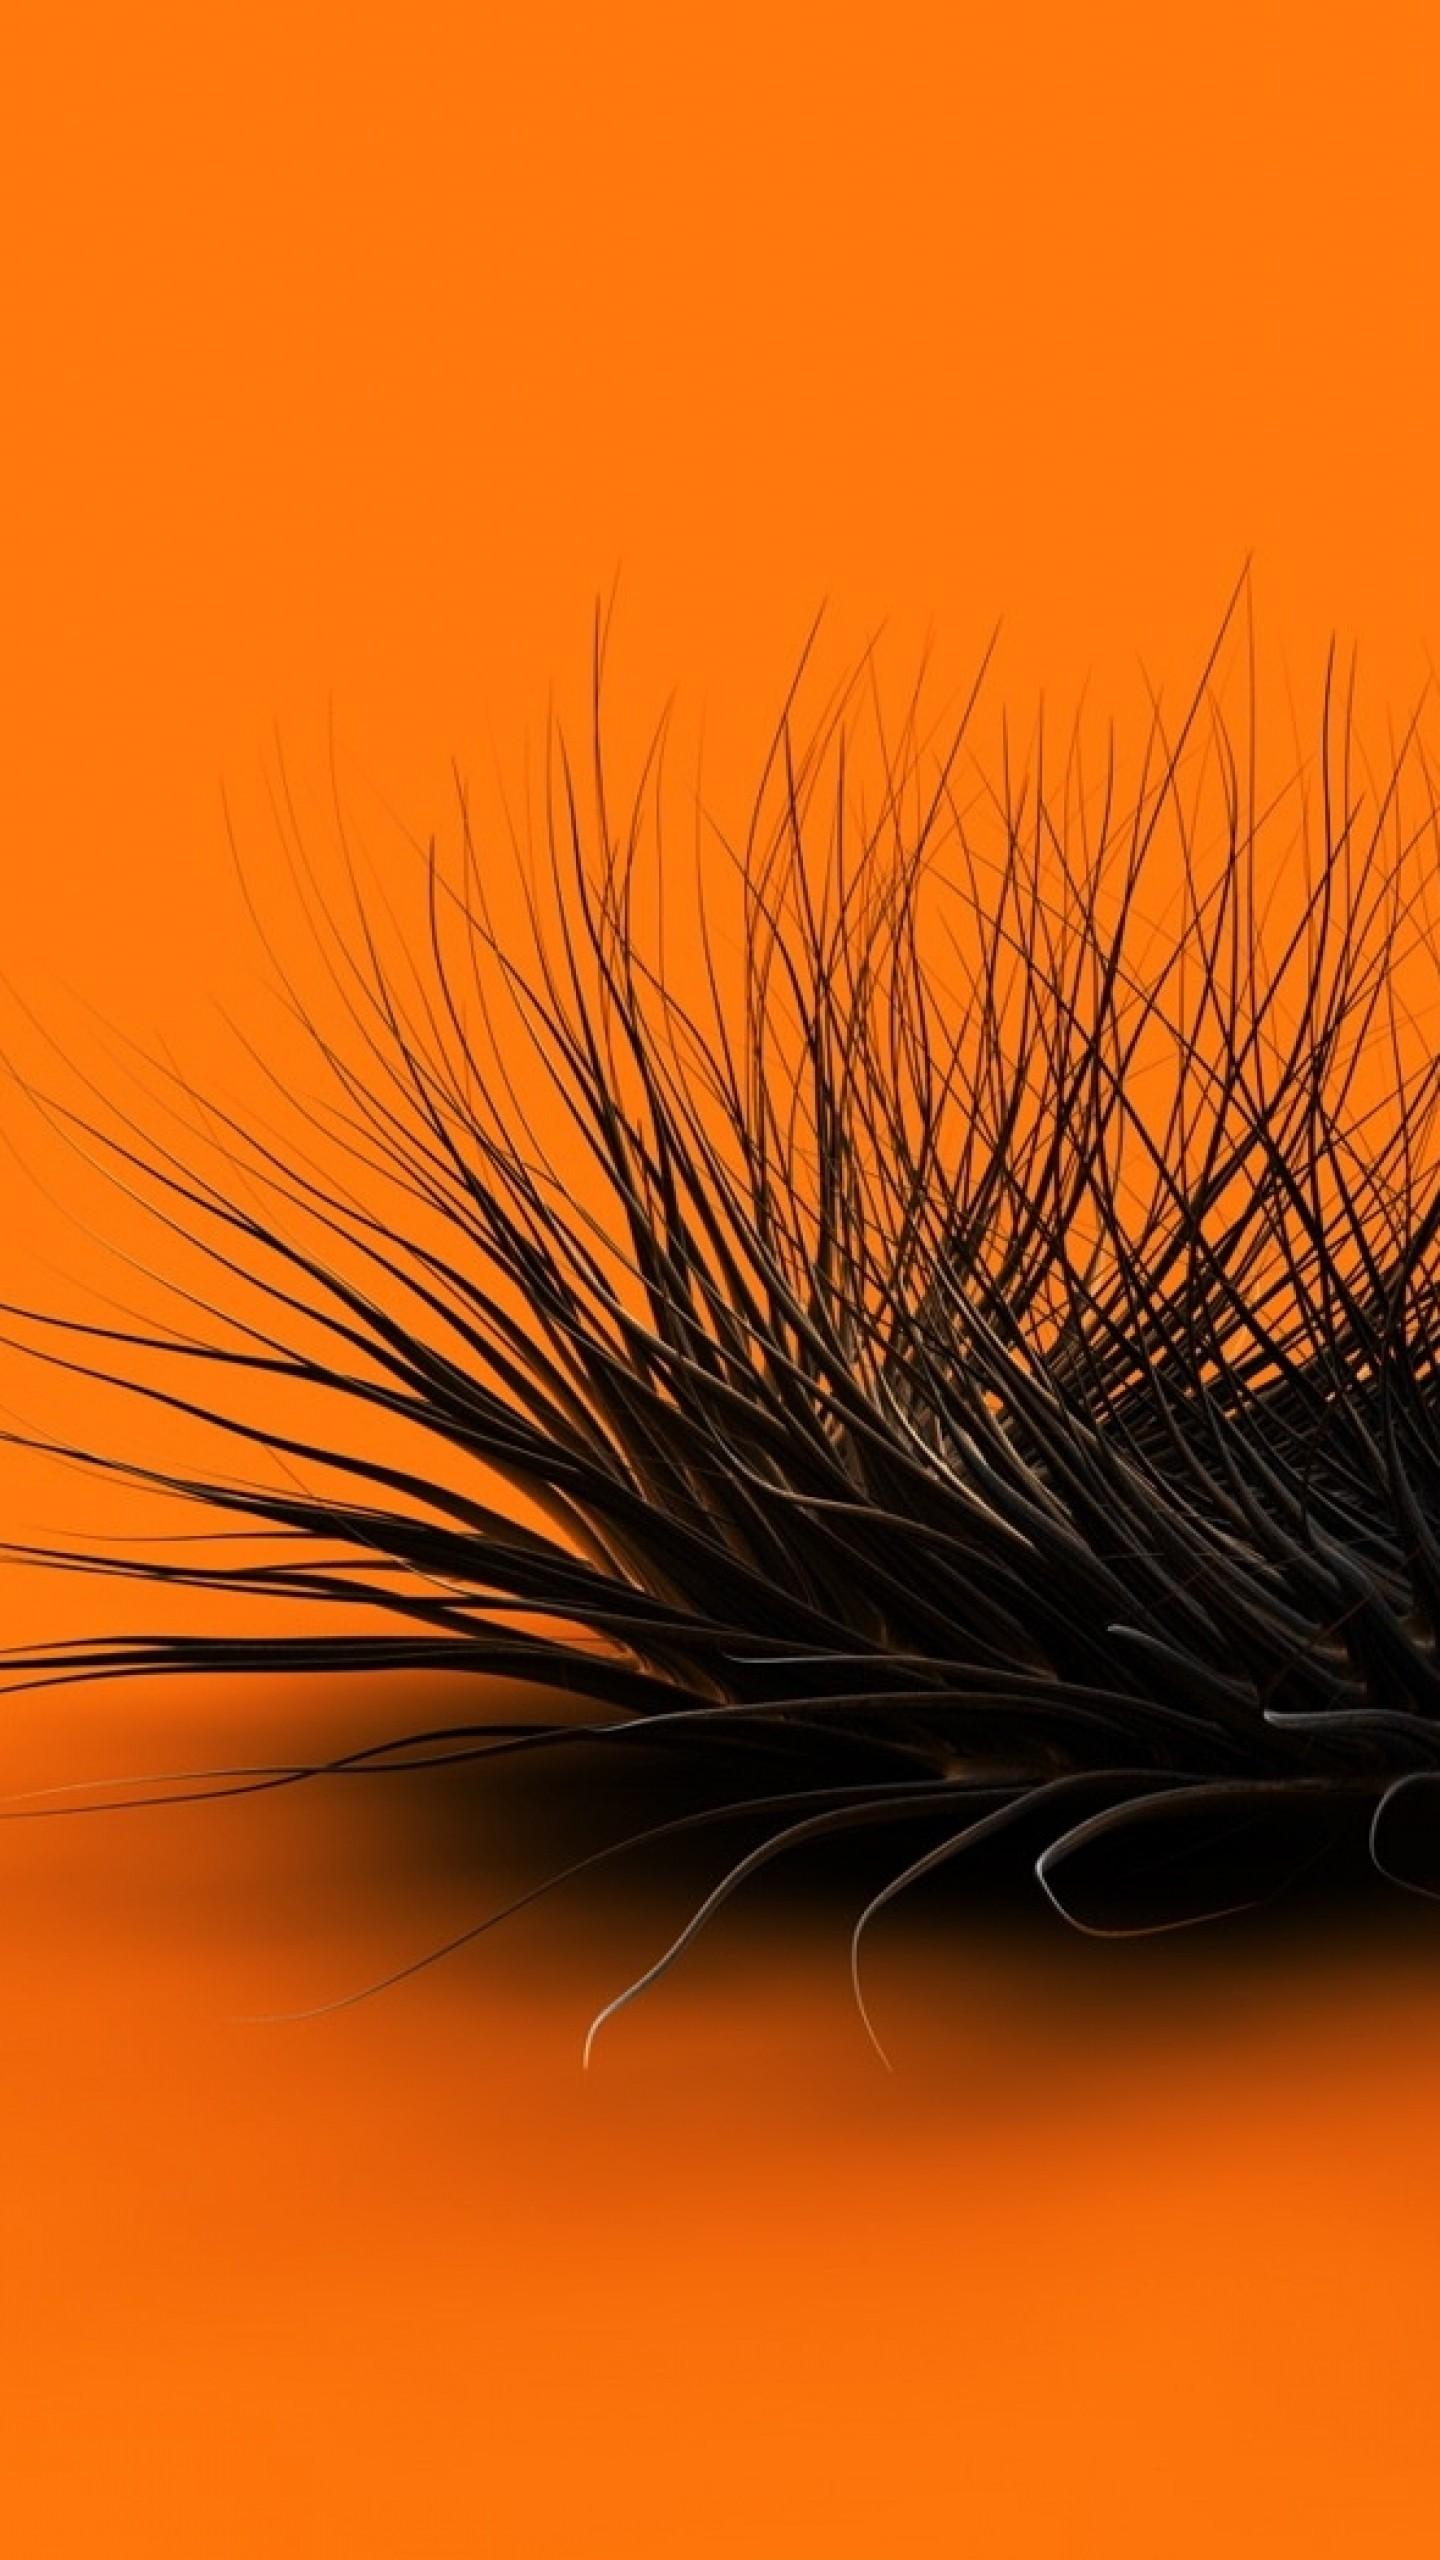 Preview wallpaper orange, black, feathers, form 1440×2560